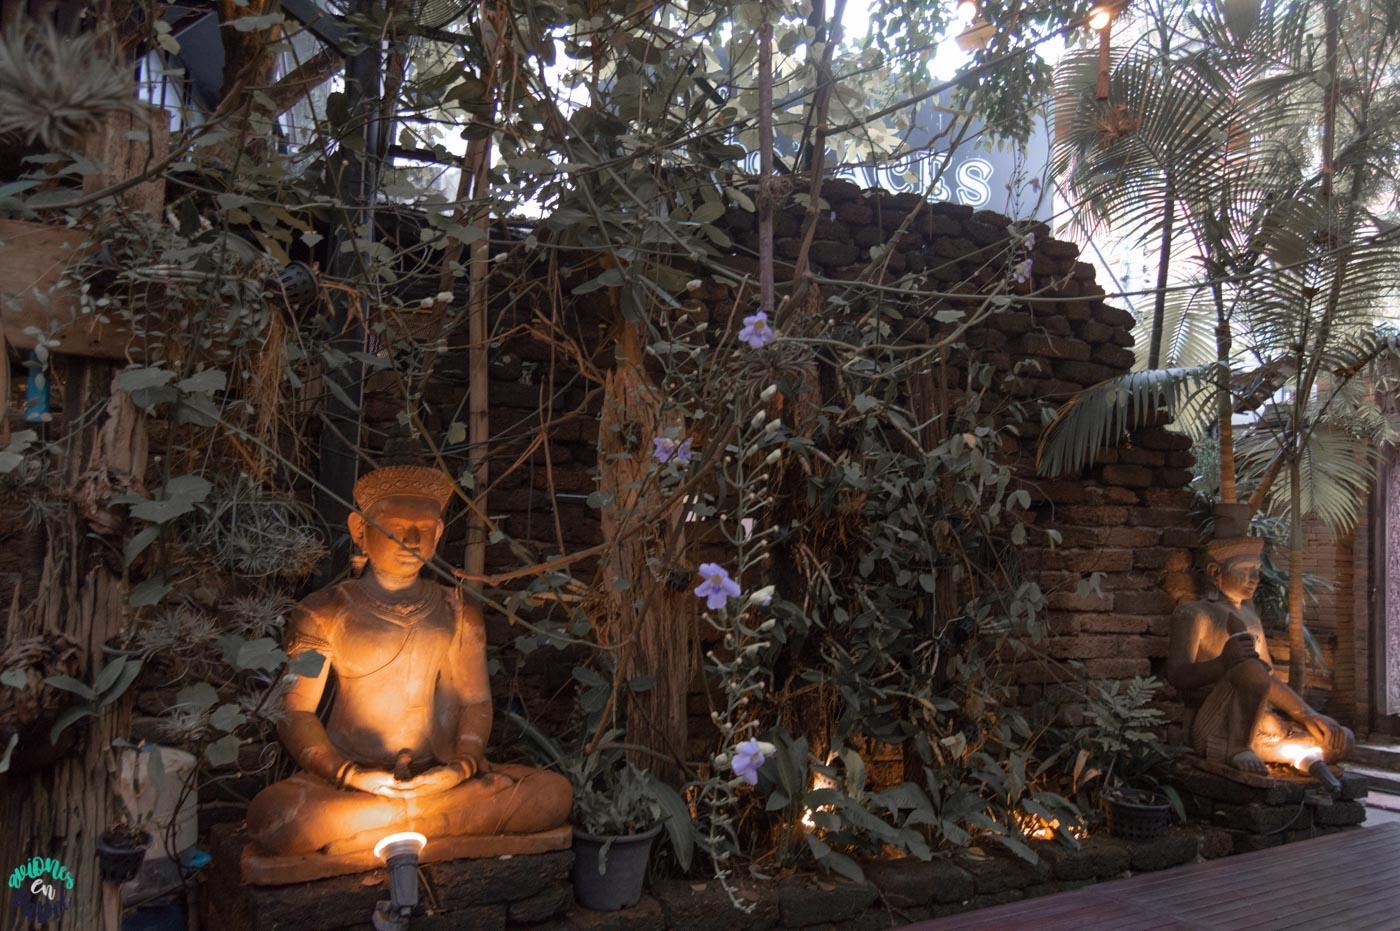 Qué ver en Chiang Mai en 3 días: Jardín de Terracota